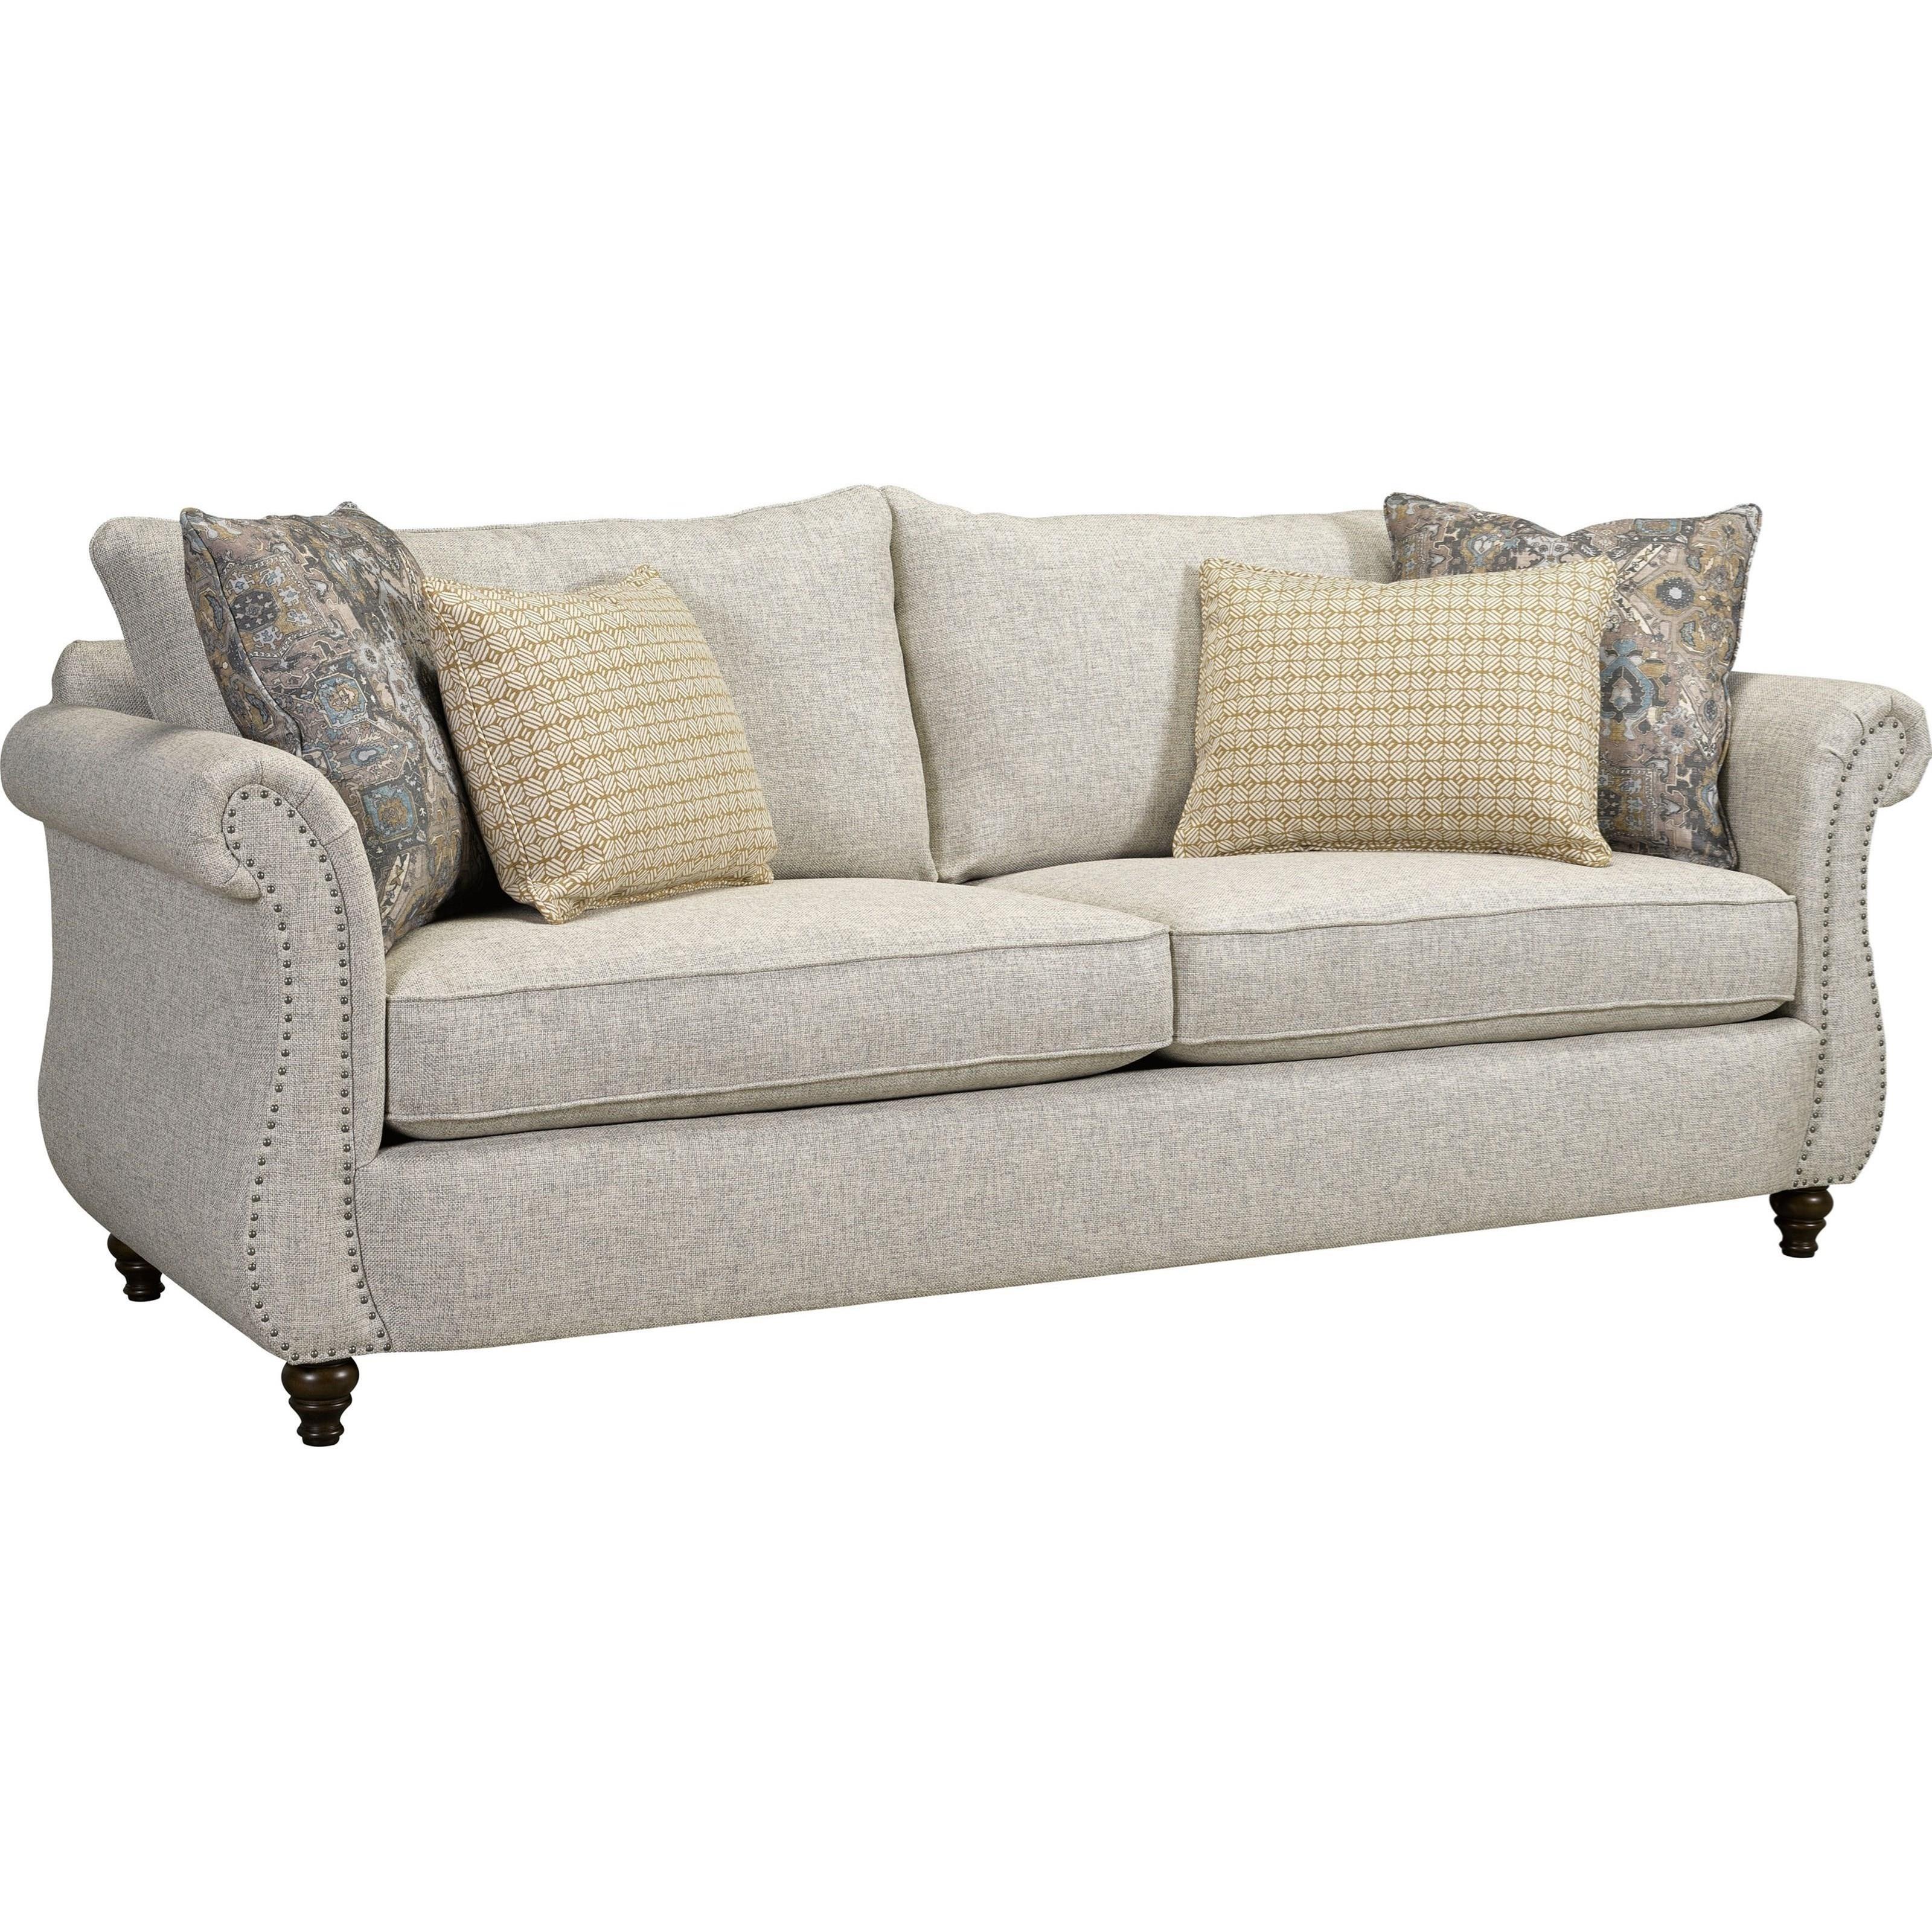 Broyhill Furniture Hattie Sofa Item Number 7932 300